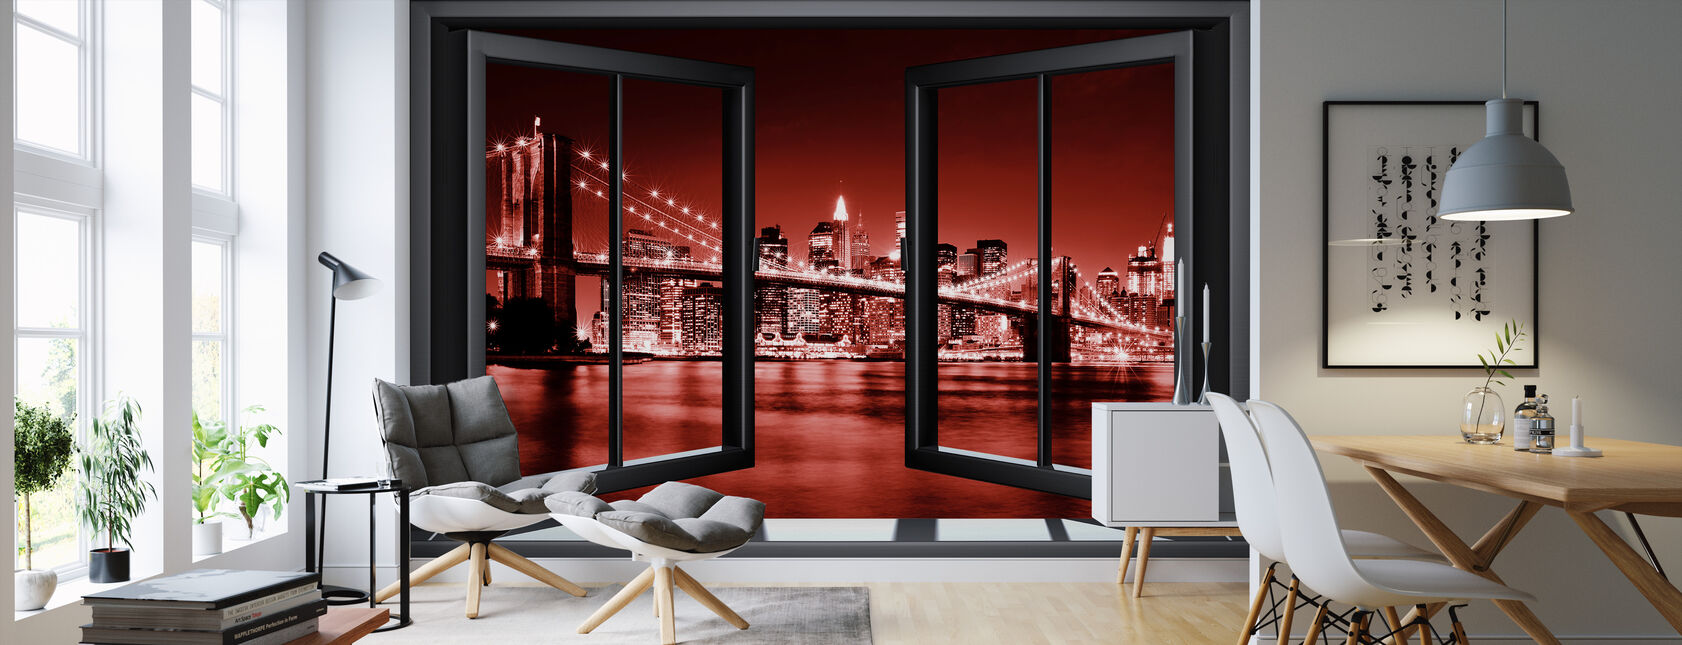 Brooklyn Bridge Through Window - Red - Wallpaper - Living Room